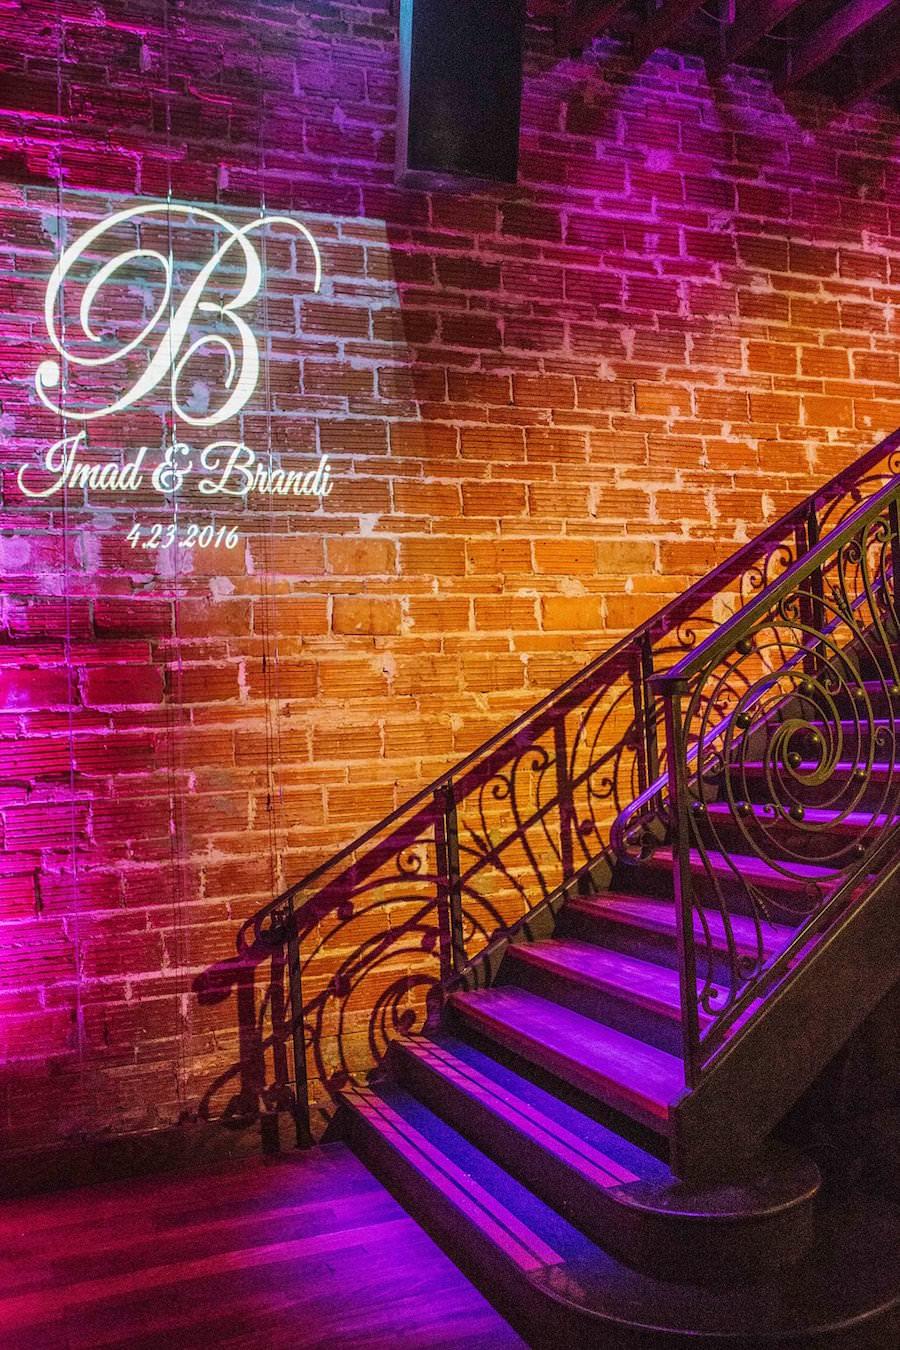 Wedding Reception with Purple and Gold Uplighting and Custom GOBO Monogram Initials | Downtown St Pete Wedding Venue NOVA 535